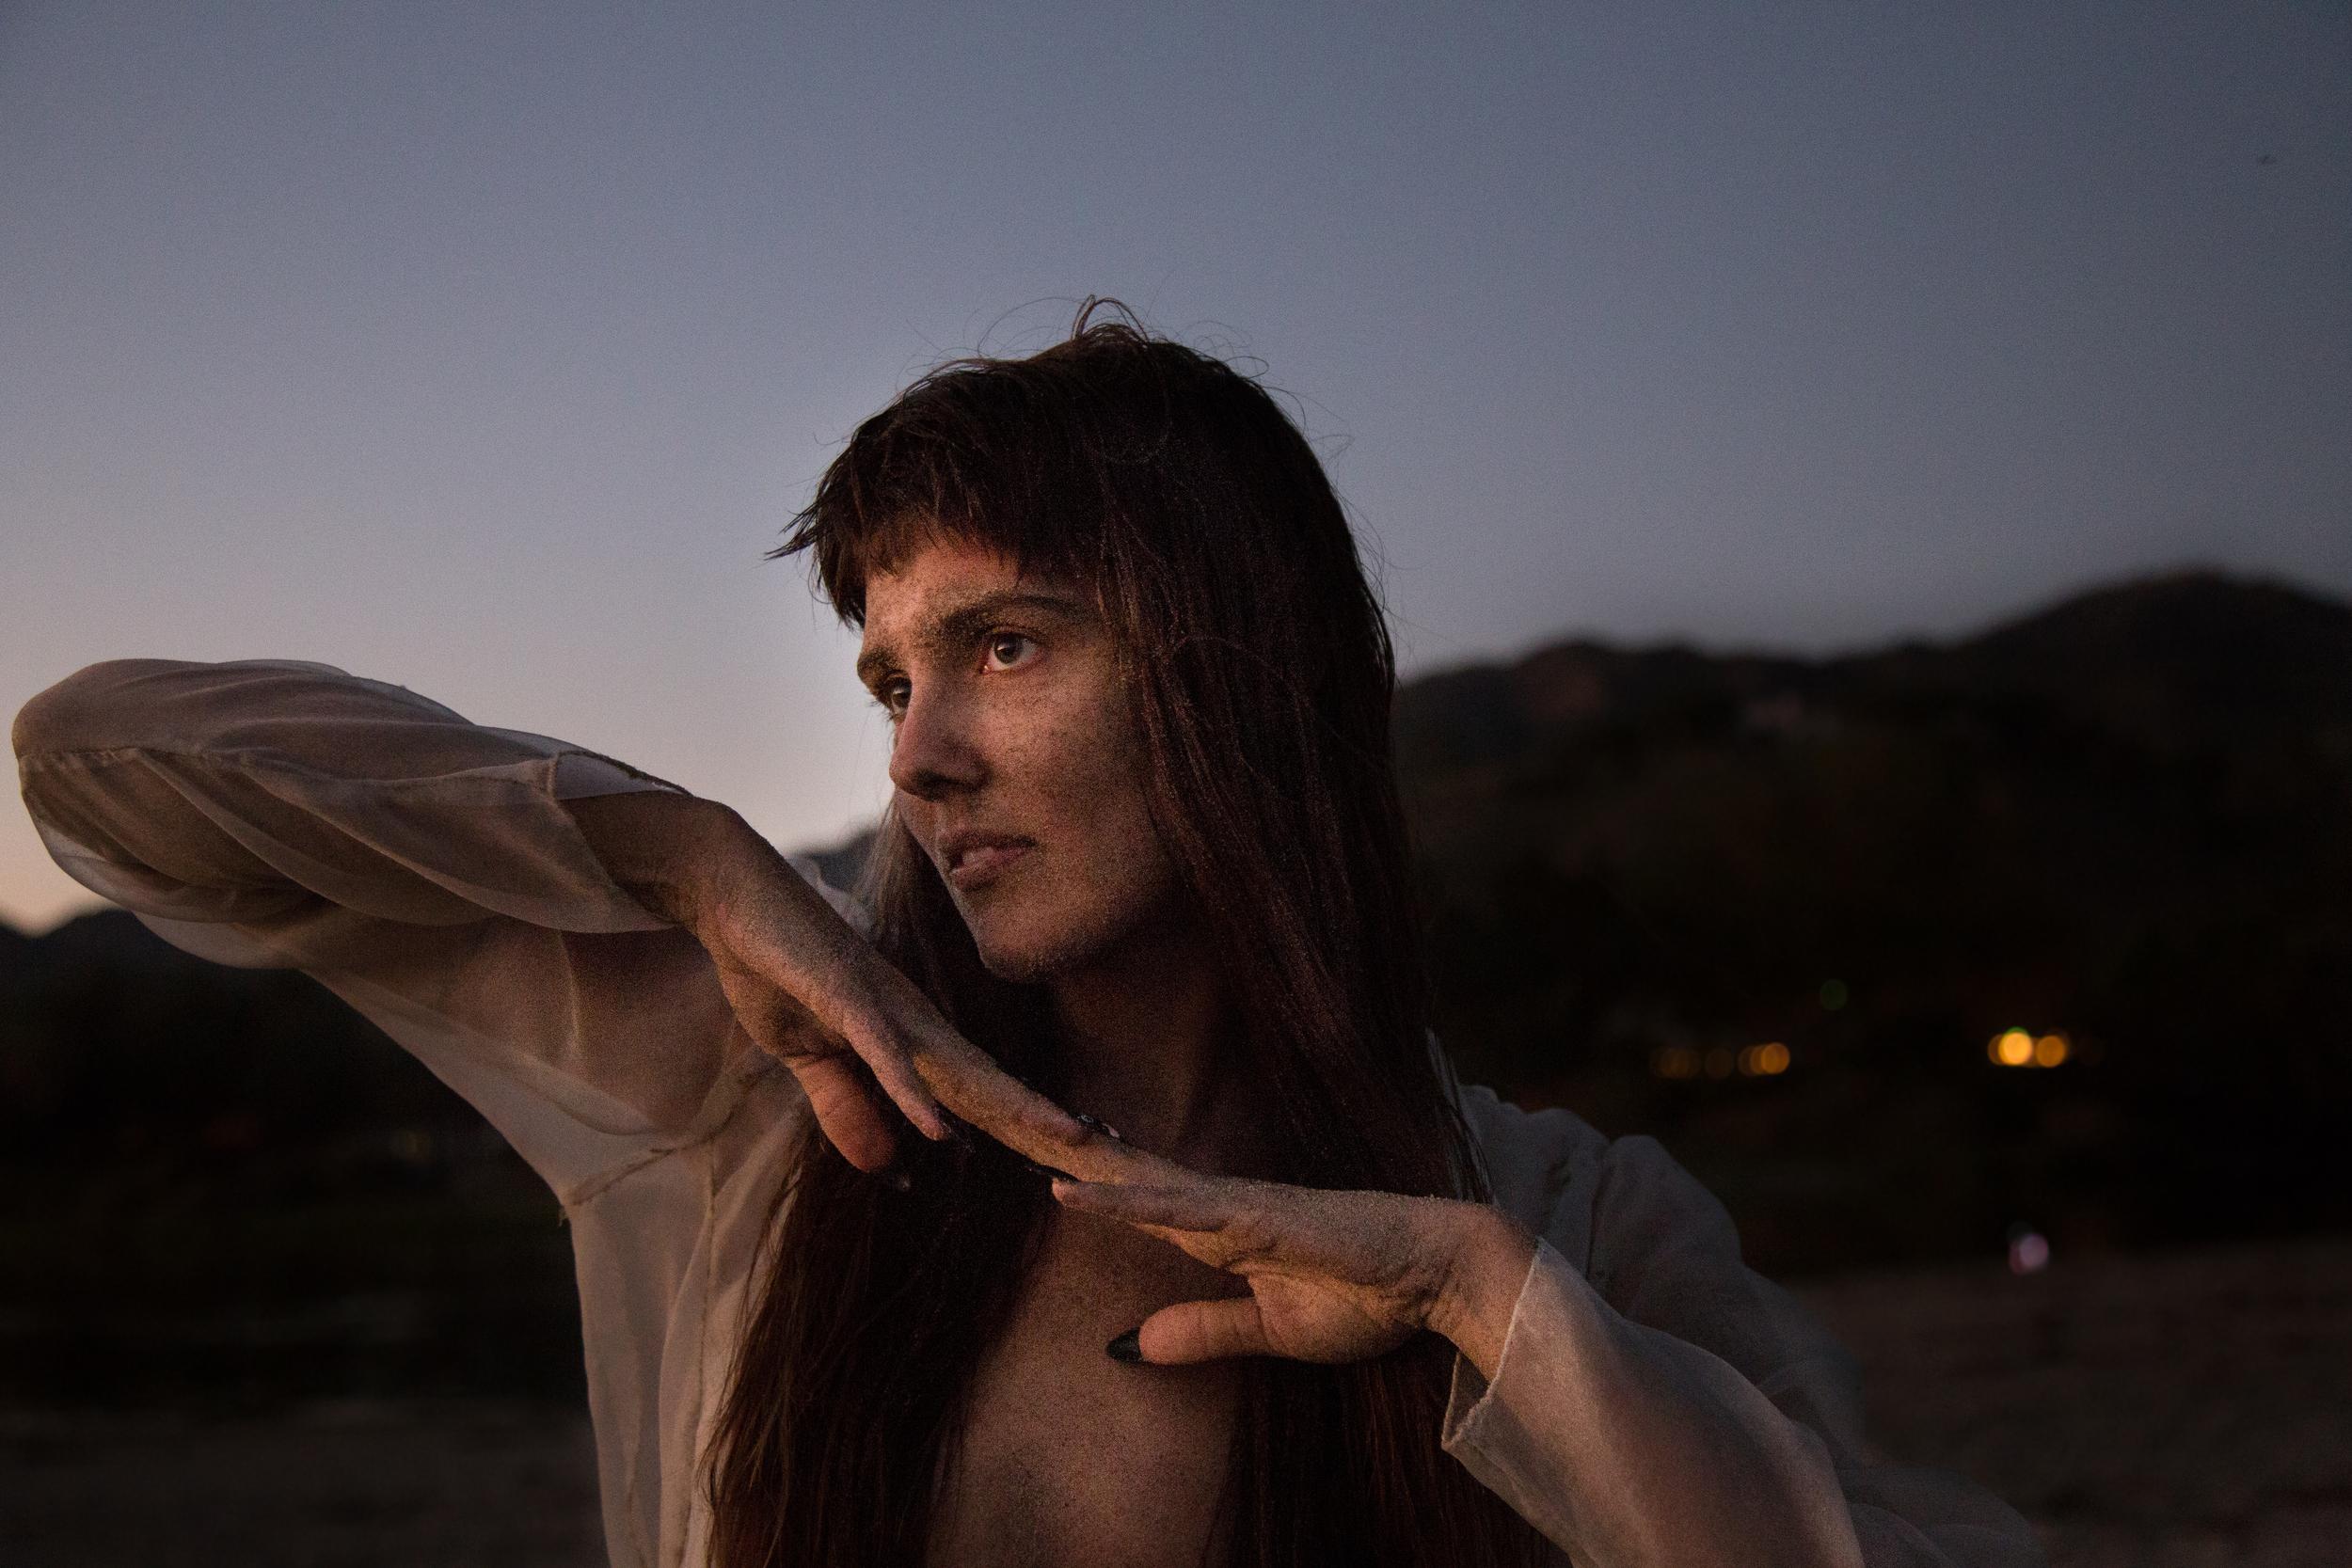 Tiffany (hands), Malibu, 2016